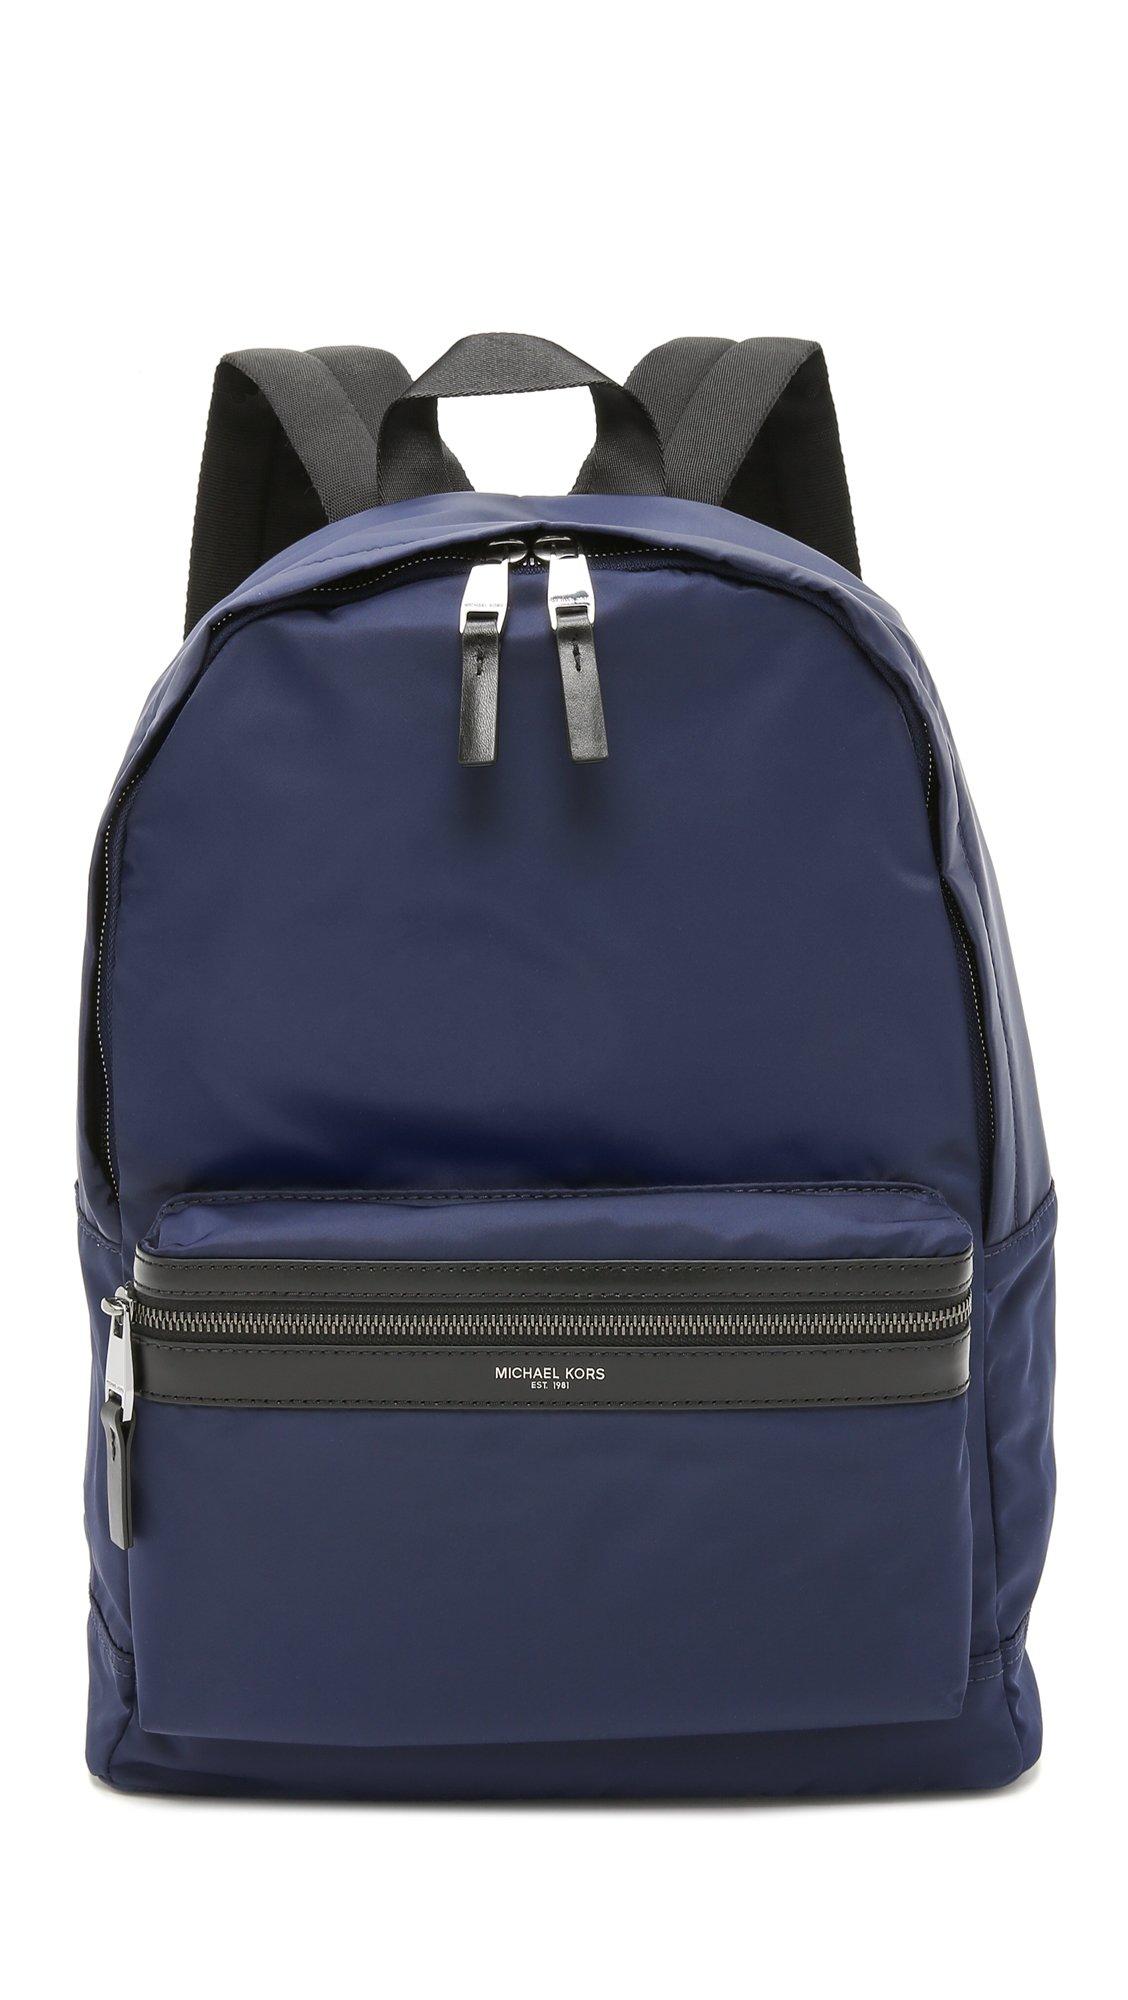 Michael Kors Nylon Backpack Indigo